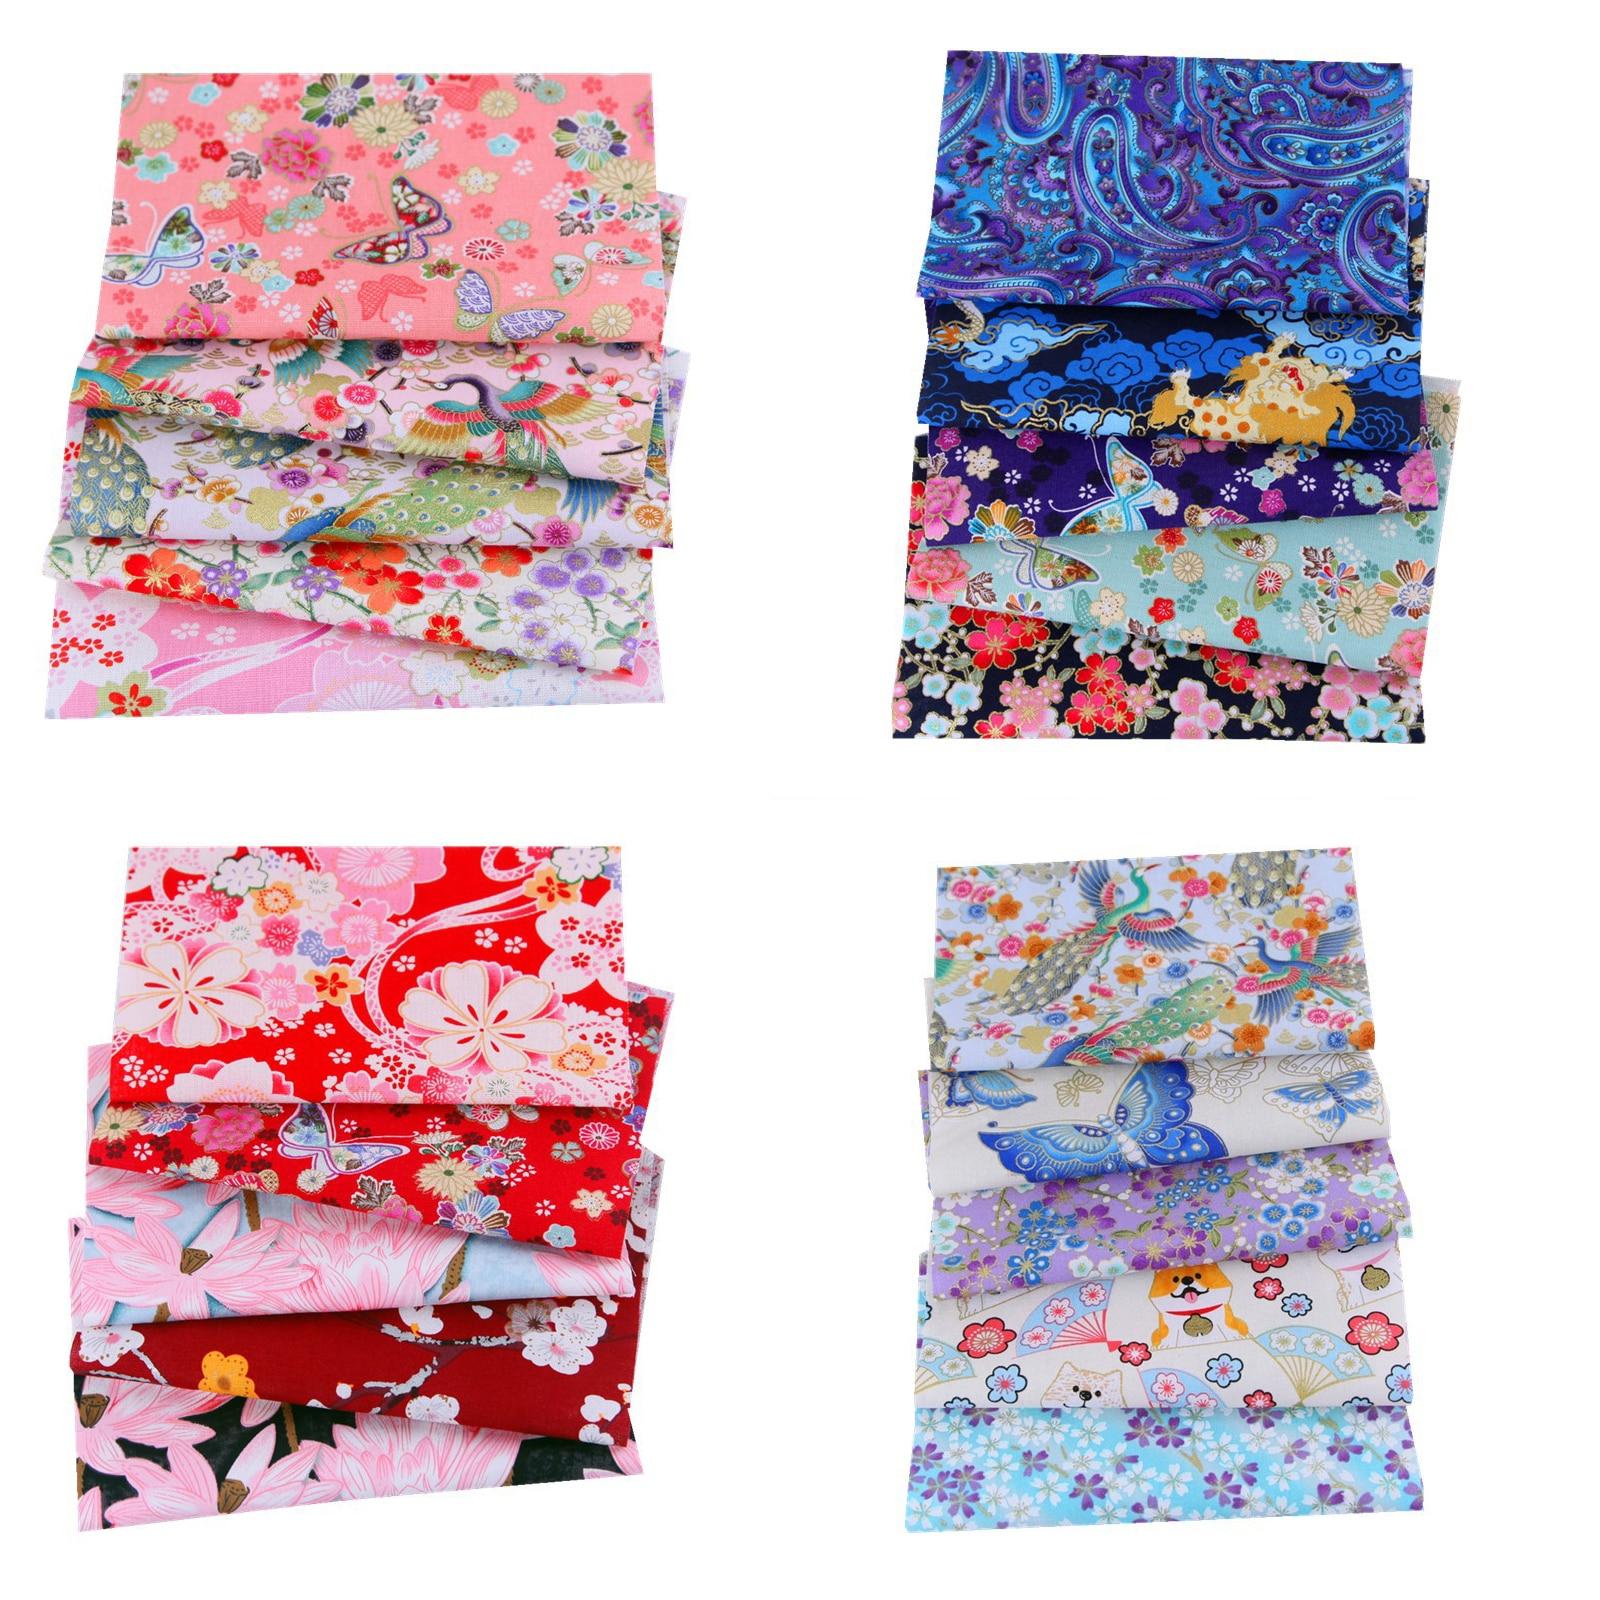 4 Sheet/5 Sheet/6 Sheet/pack 20*25CM Apparel Fabric Floral Print Cloth Material Cotton DIY Handmade Patchwork Sewing Supplies